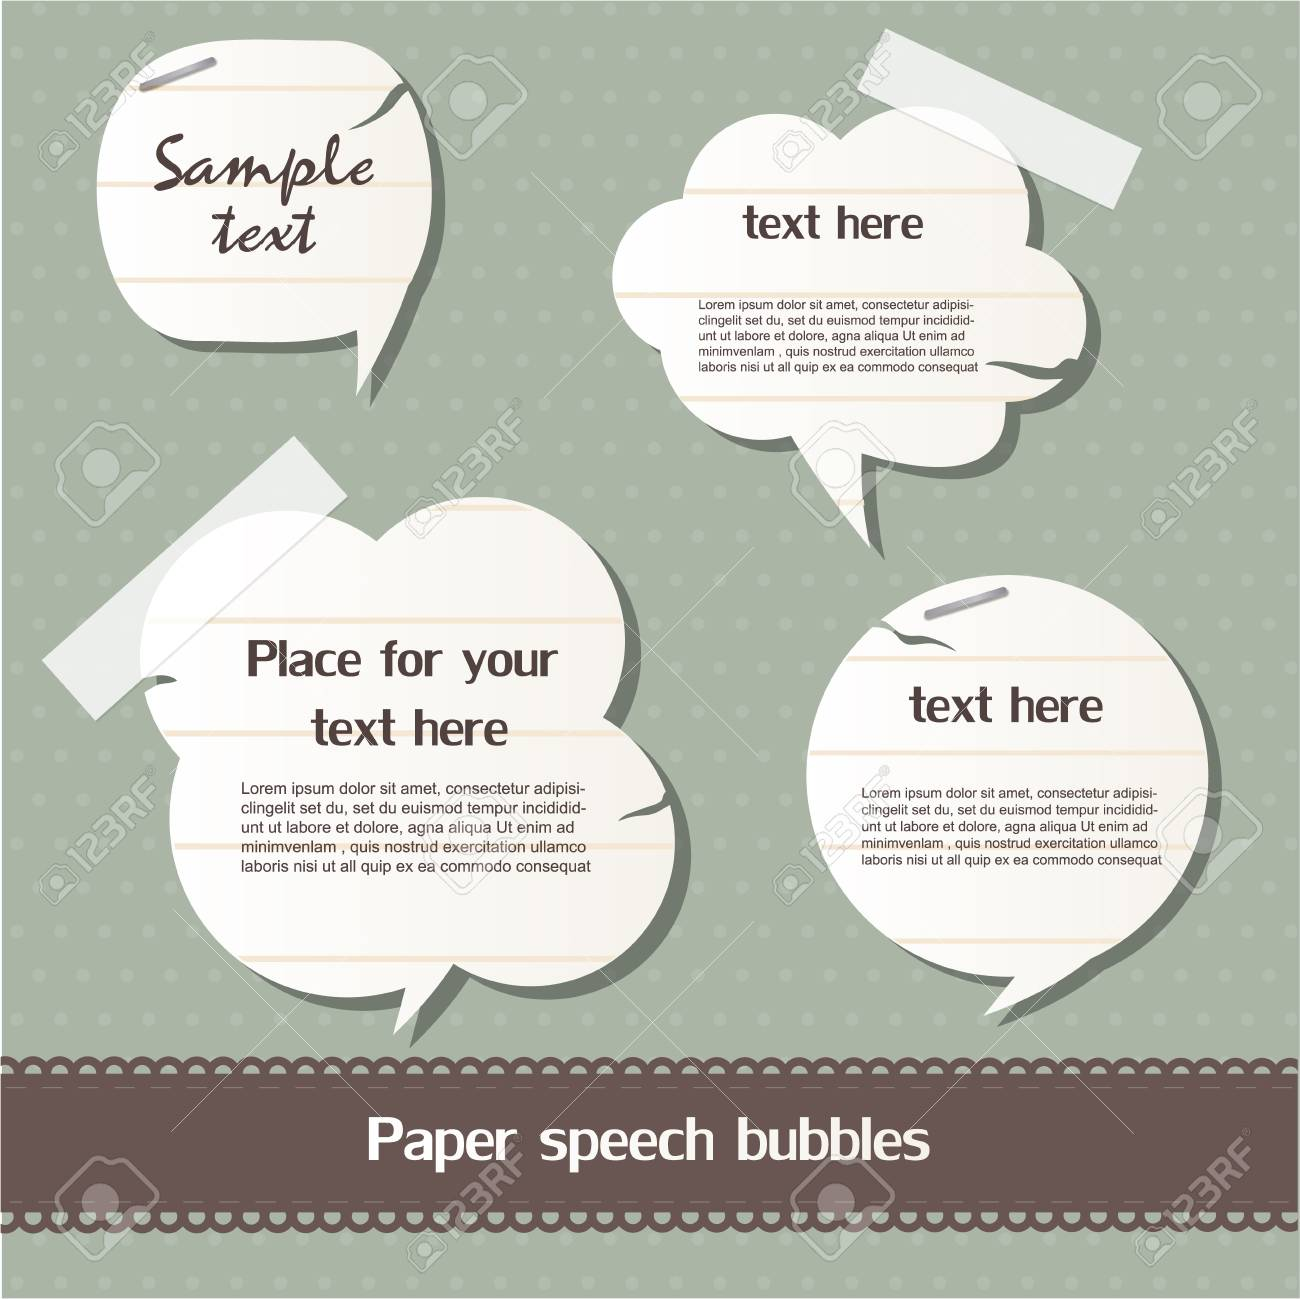 Paper speech bubbles Stock Vector - 12793350